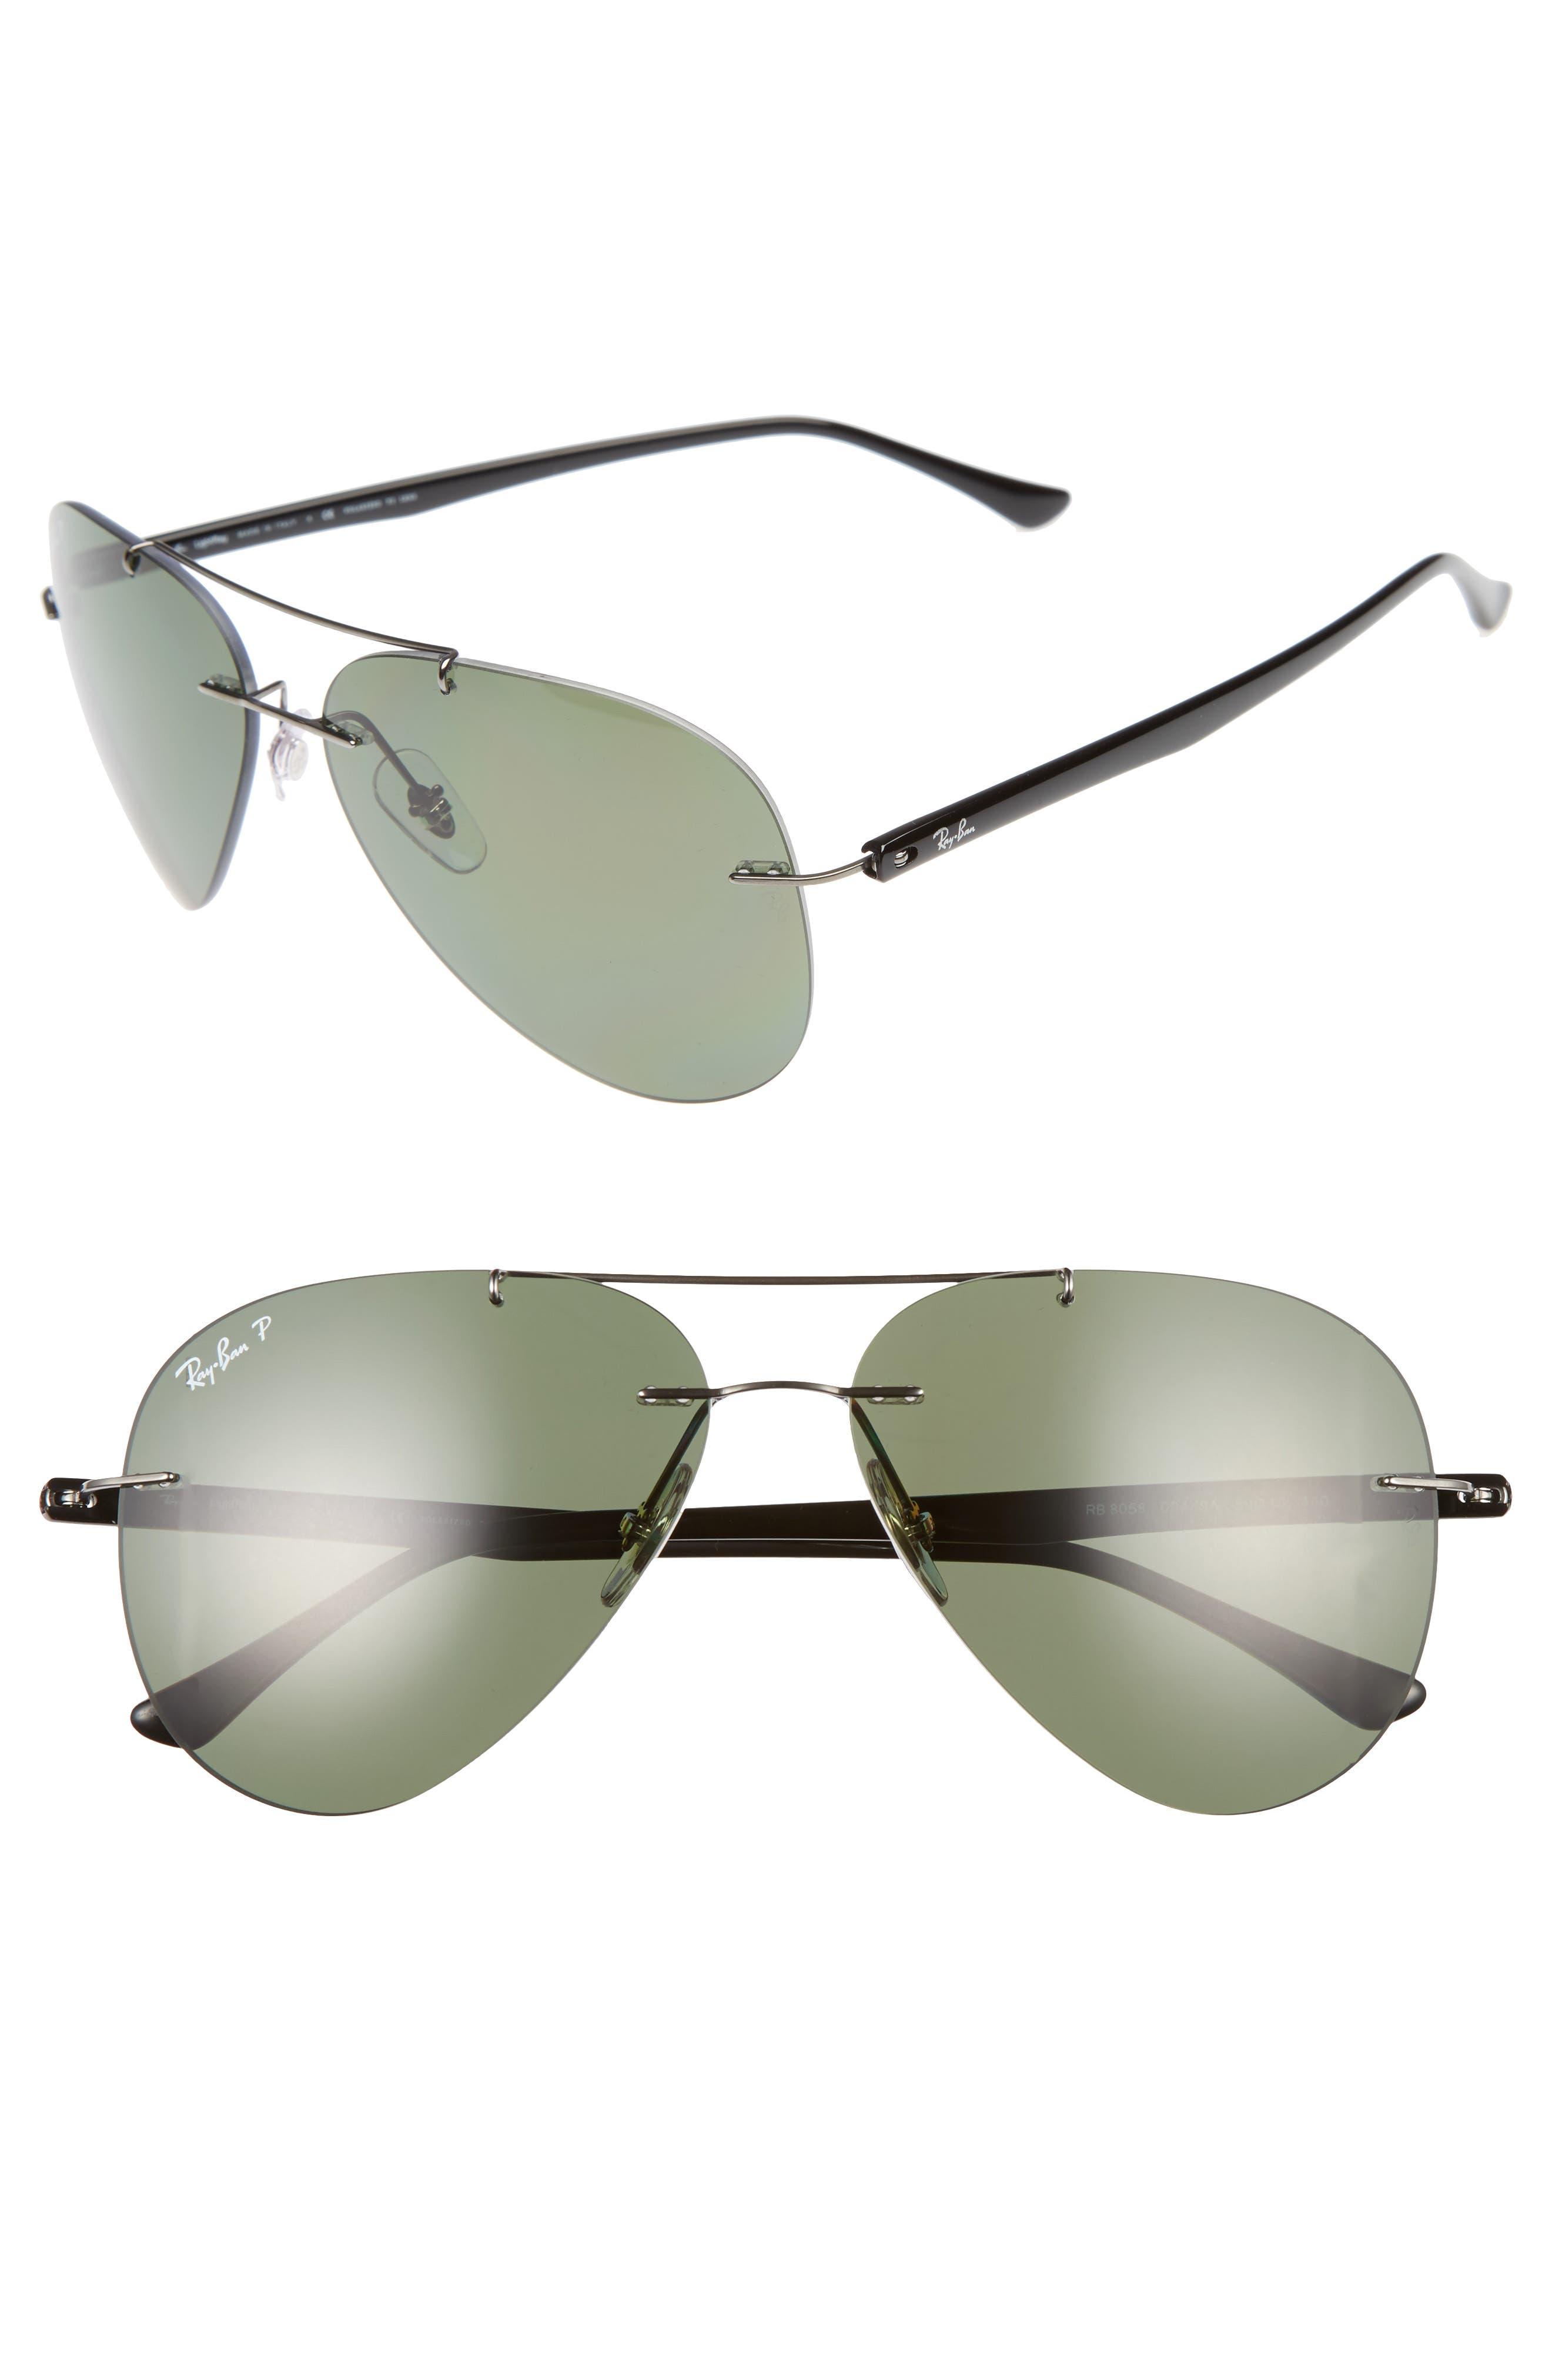 59mm Polarized Aviator Sunglasses,                             Main thumbnail 1, color,                             322